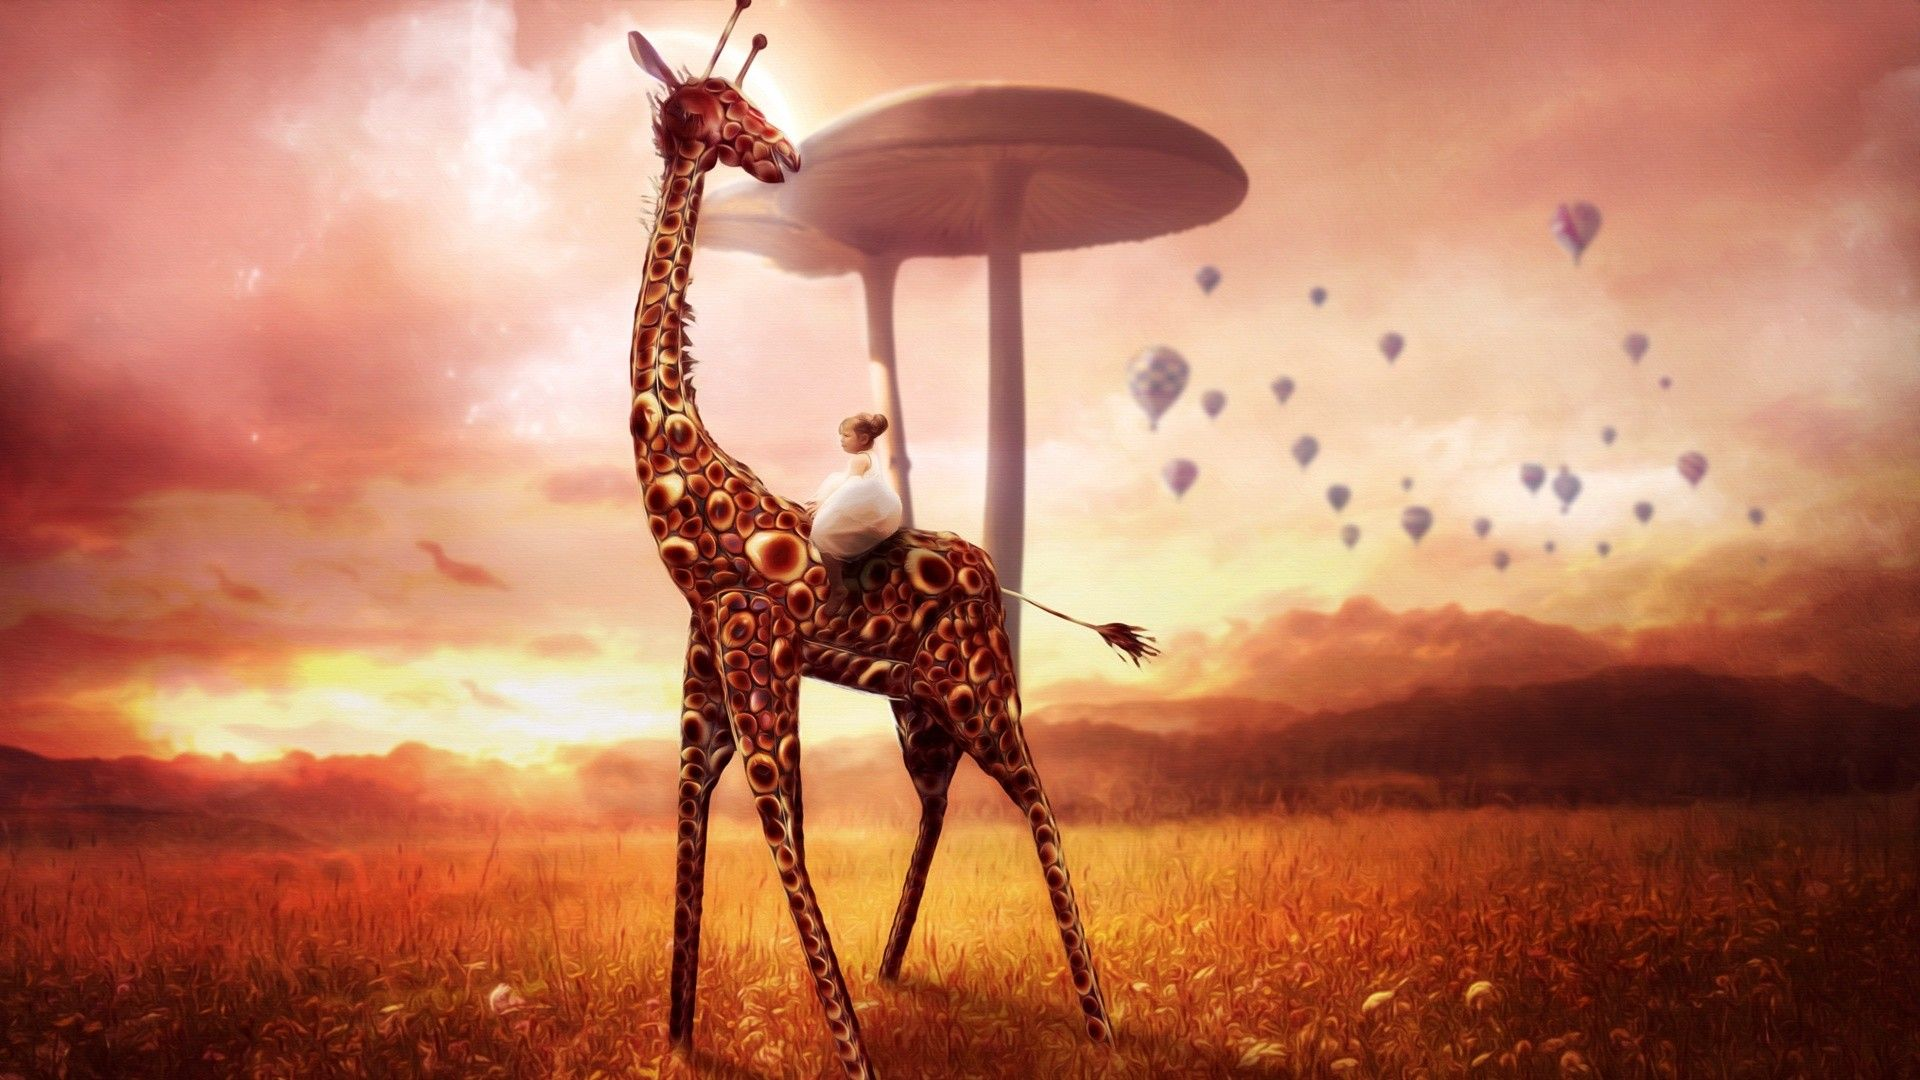 Free Giraffe Dream Phone Wallpaper By Lilmama78 Dream Art Creative Graphics Graphic Wallpaper